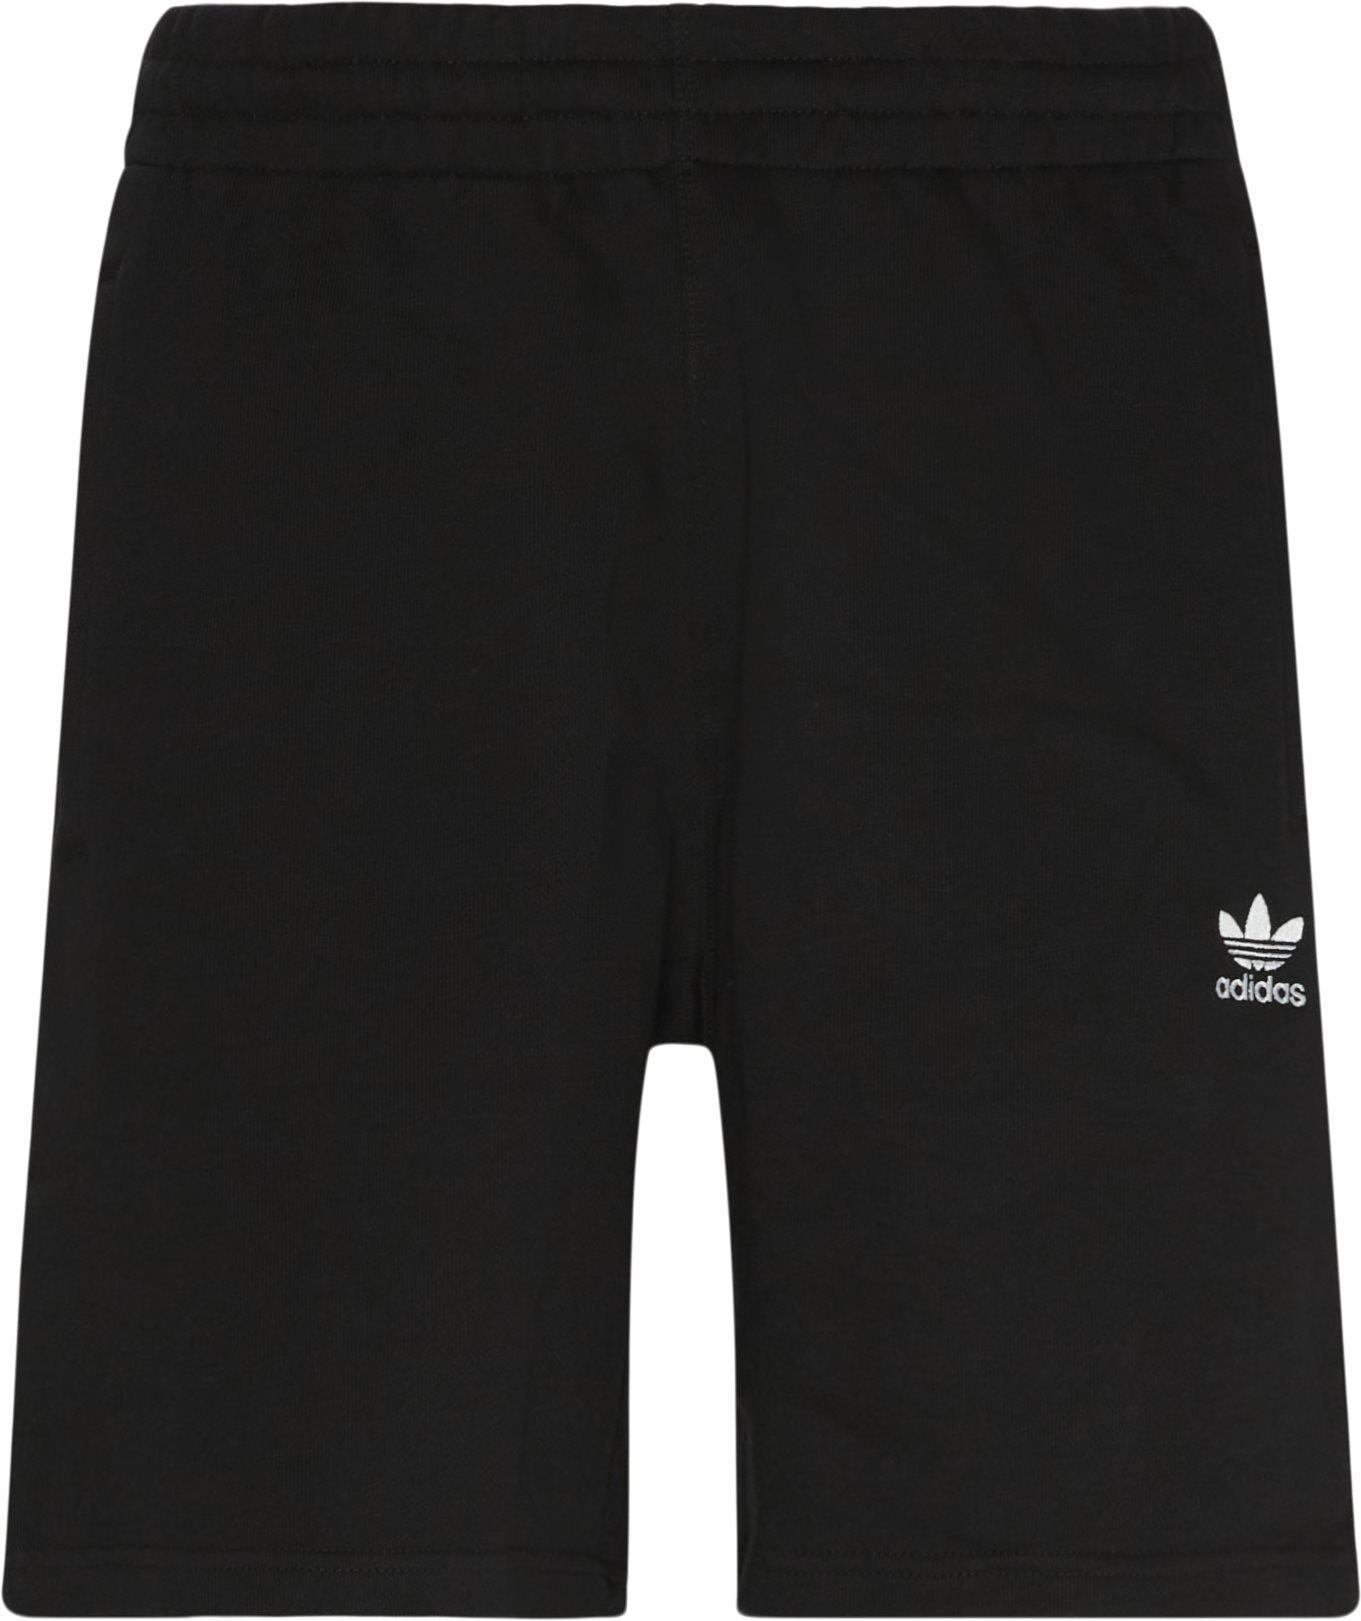 Essential Shorts - Shorts - Regular fit - Sort